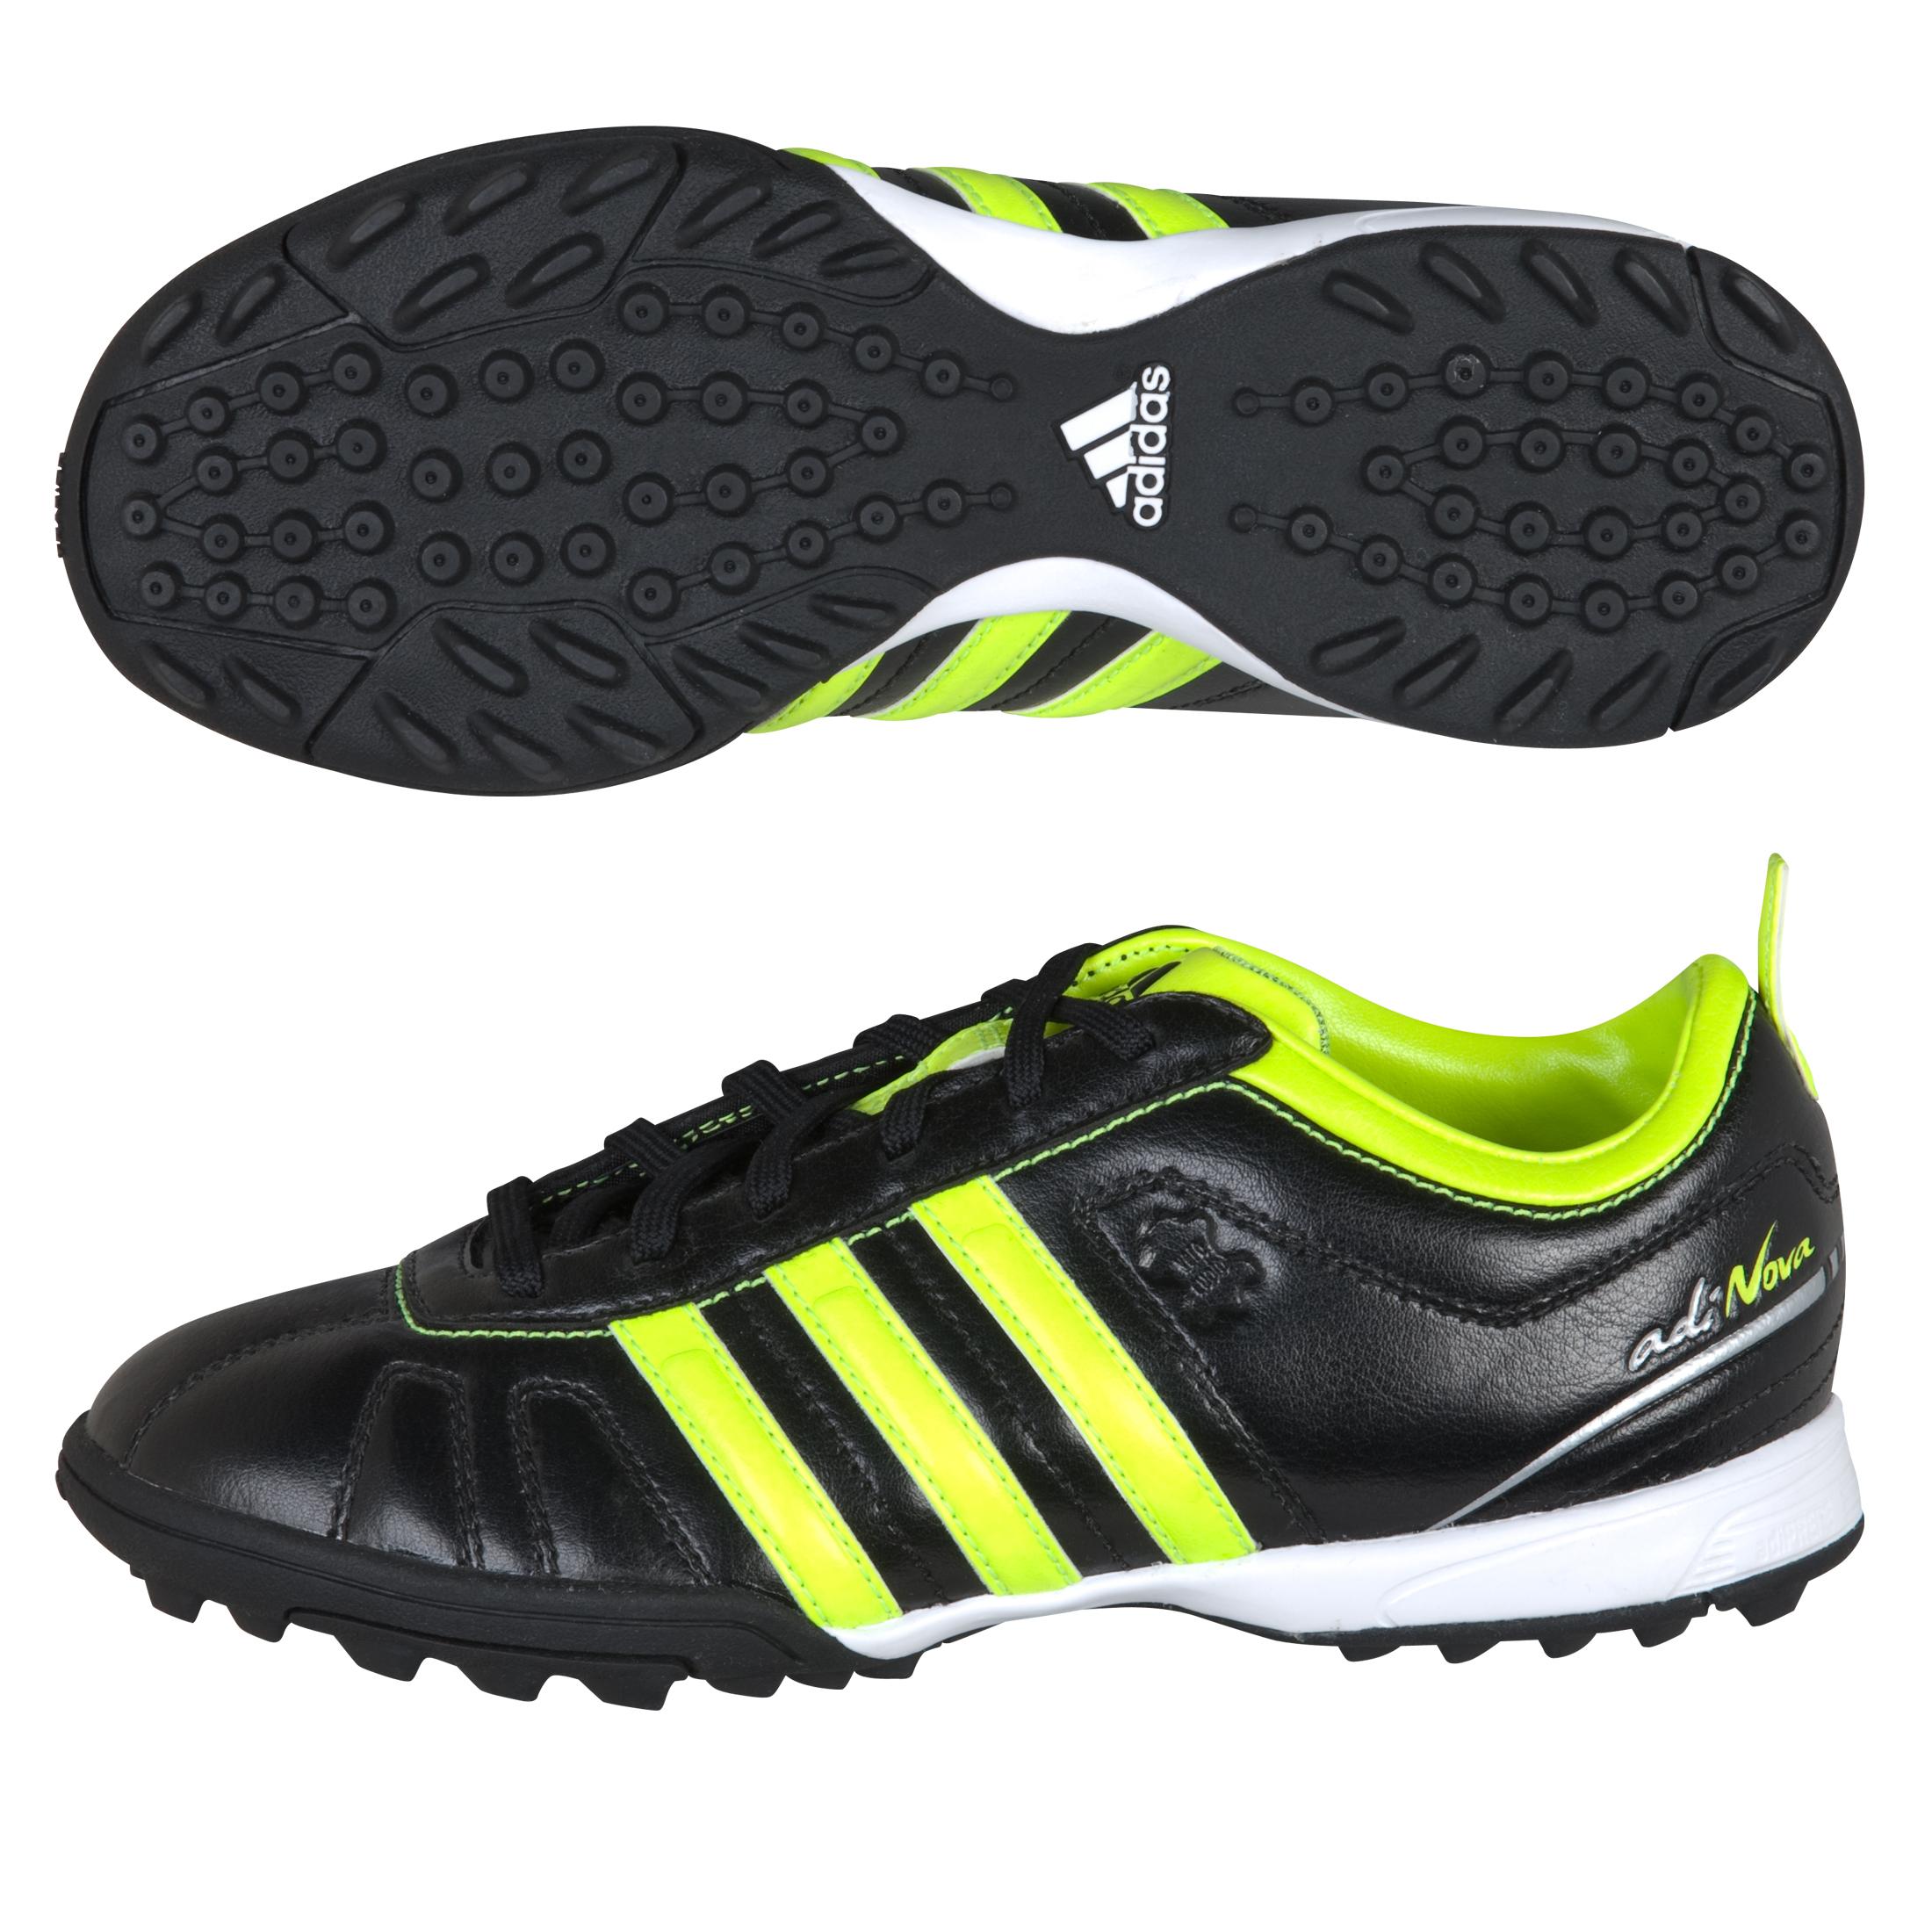 sports shoes 6ea08 af17a adidas adiNova IV TRX Astro Turf Trainers - Black Electricity Silver Met -  Kids